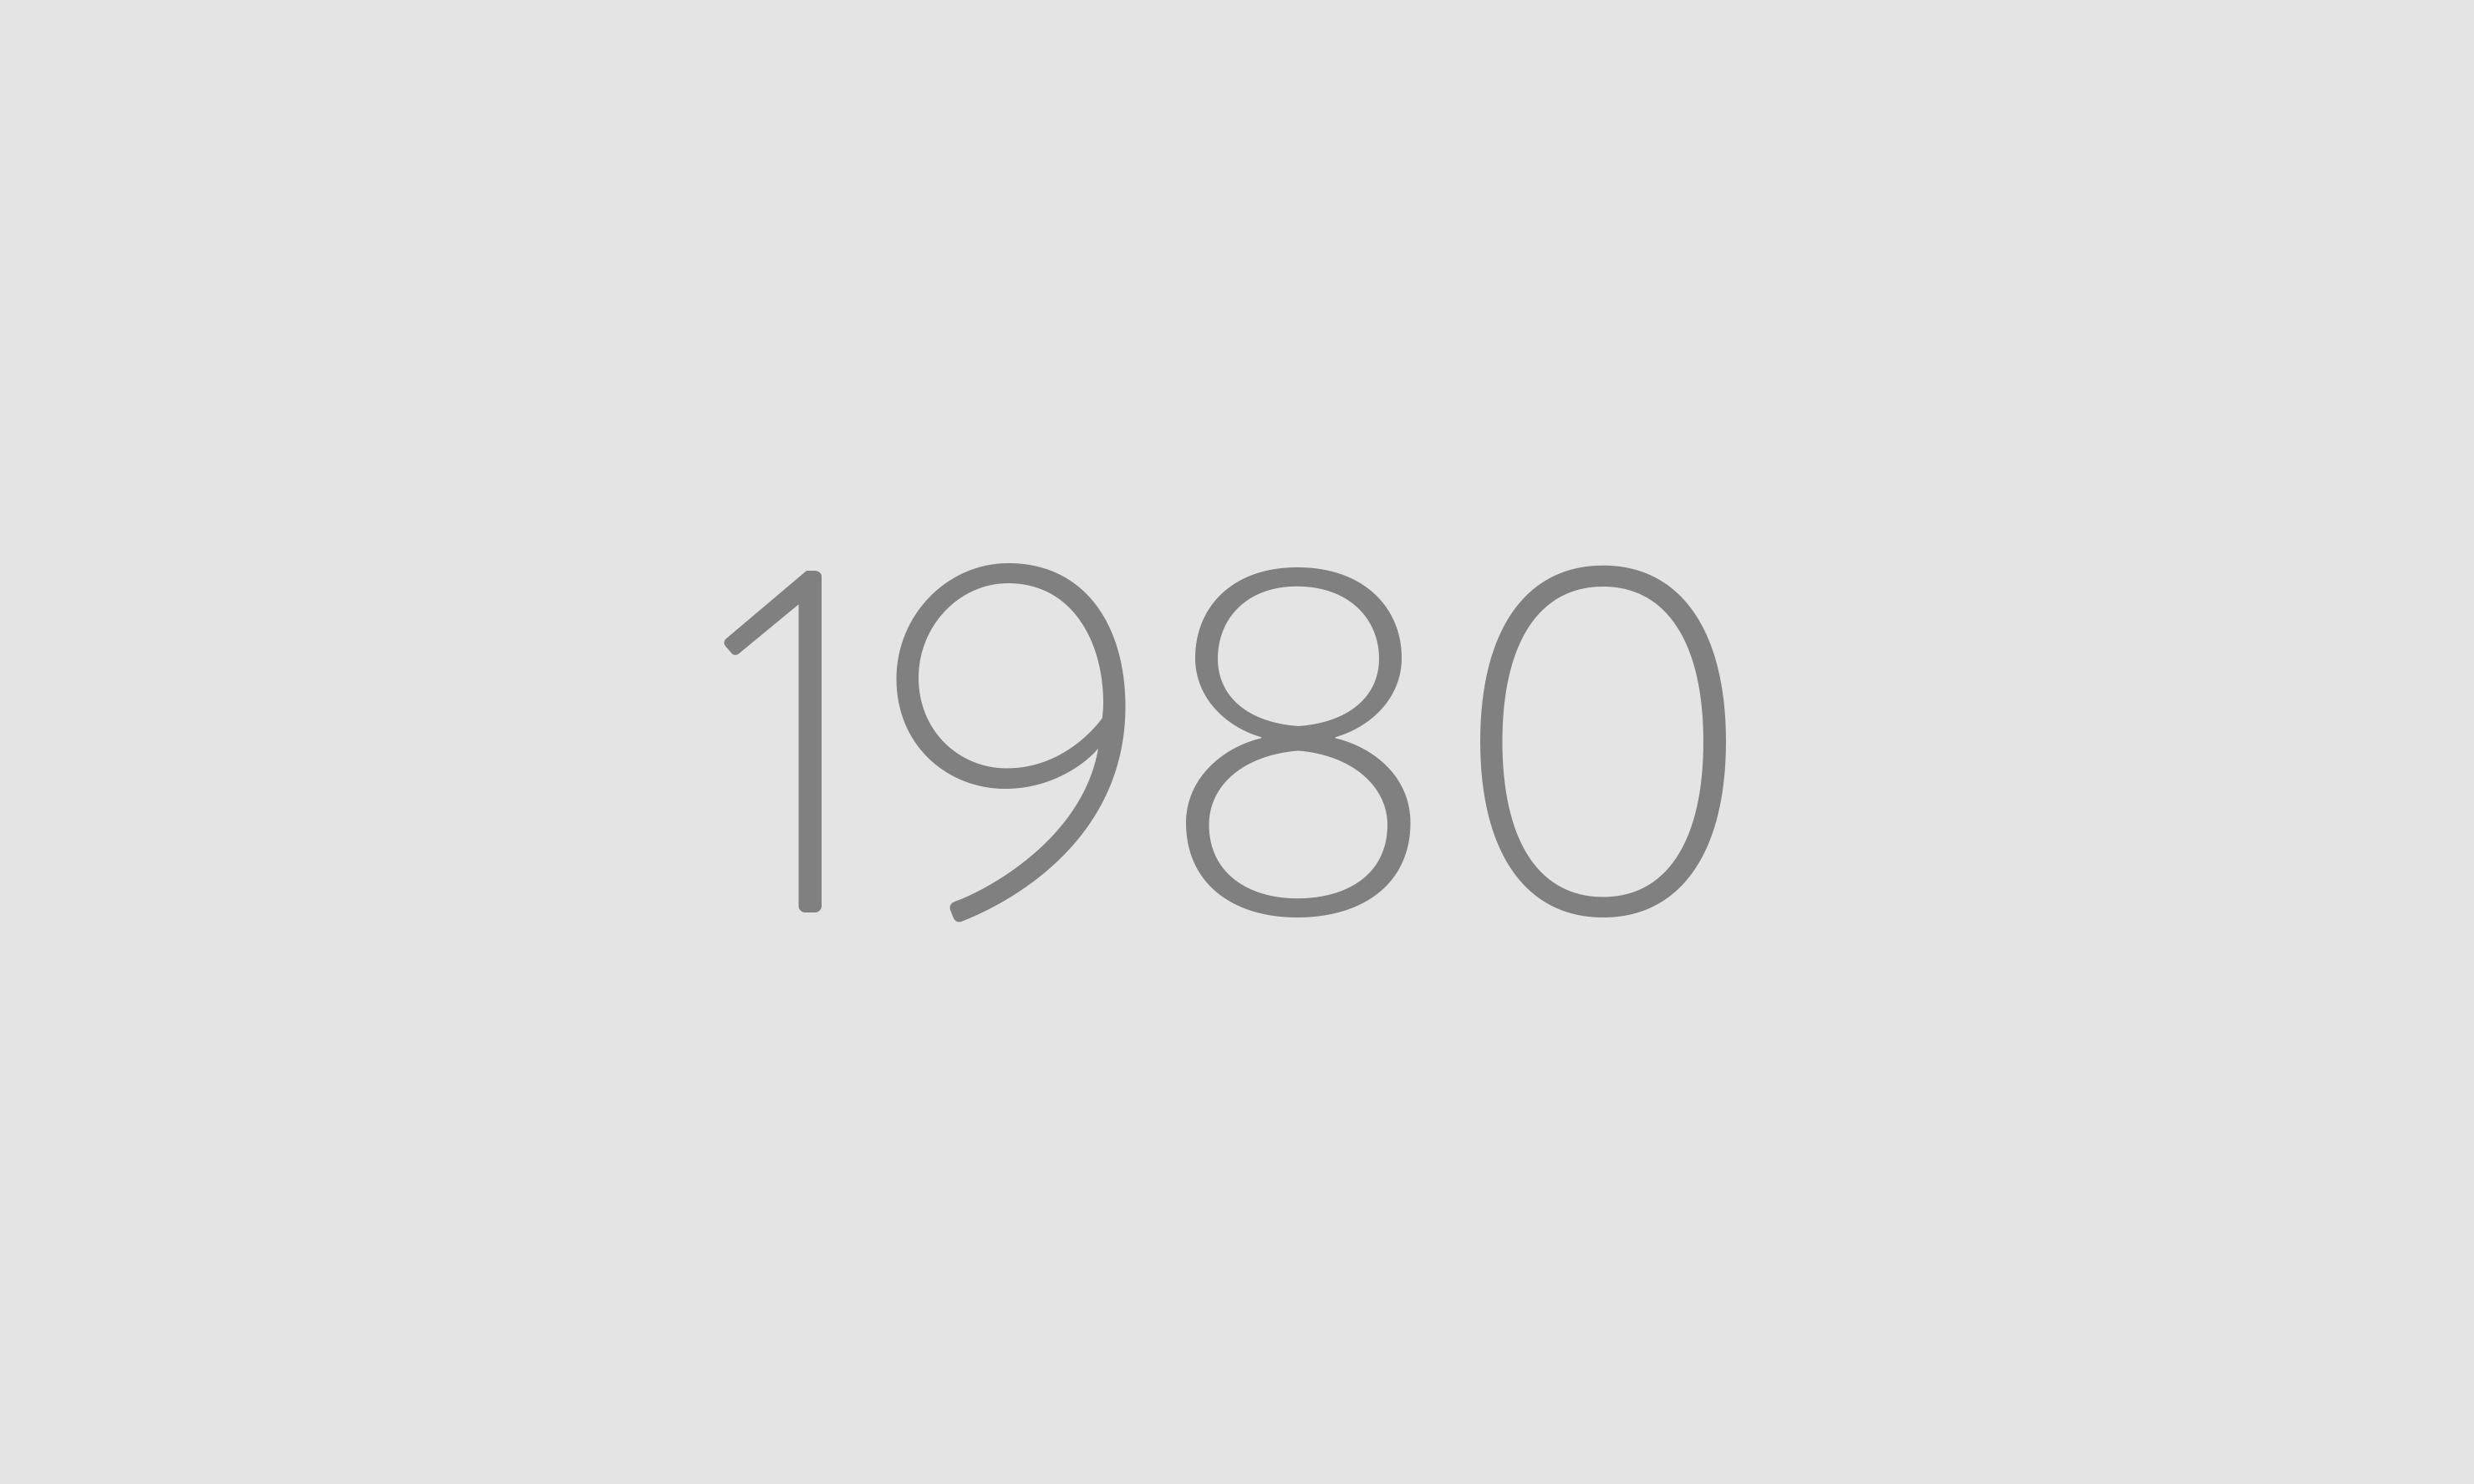 1980 - The journey begins